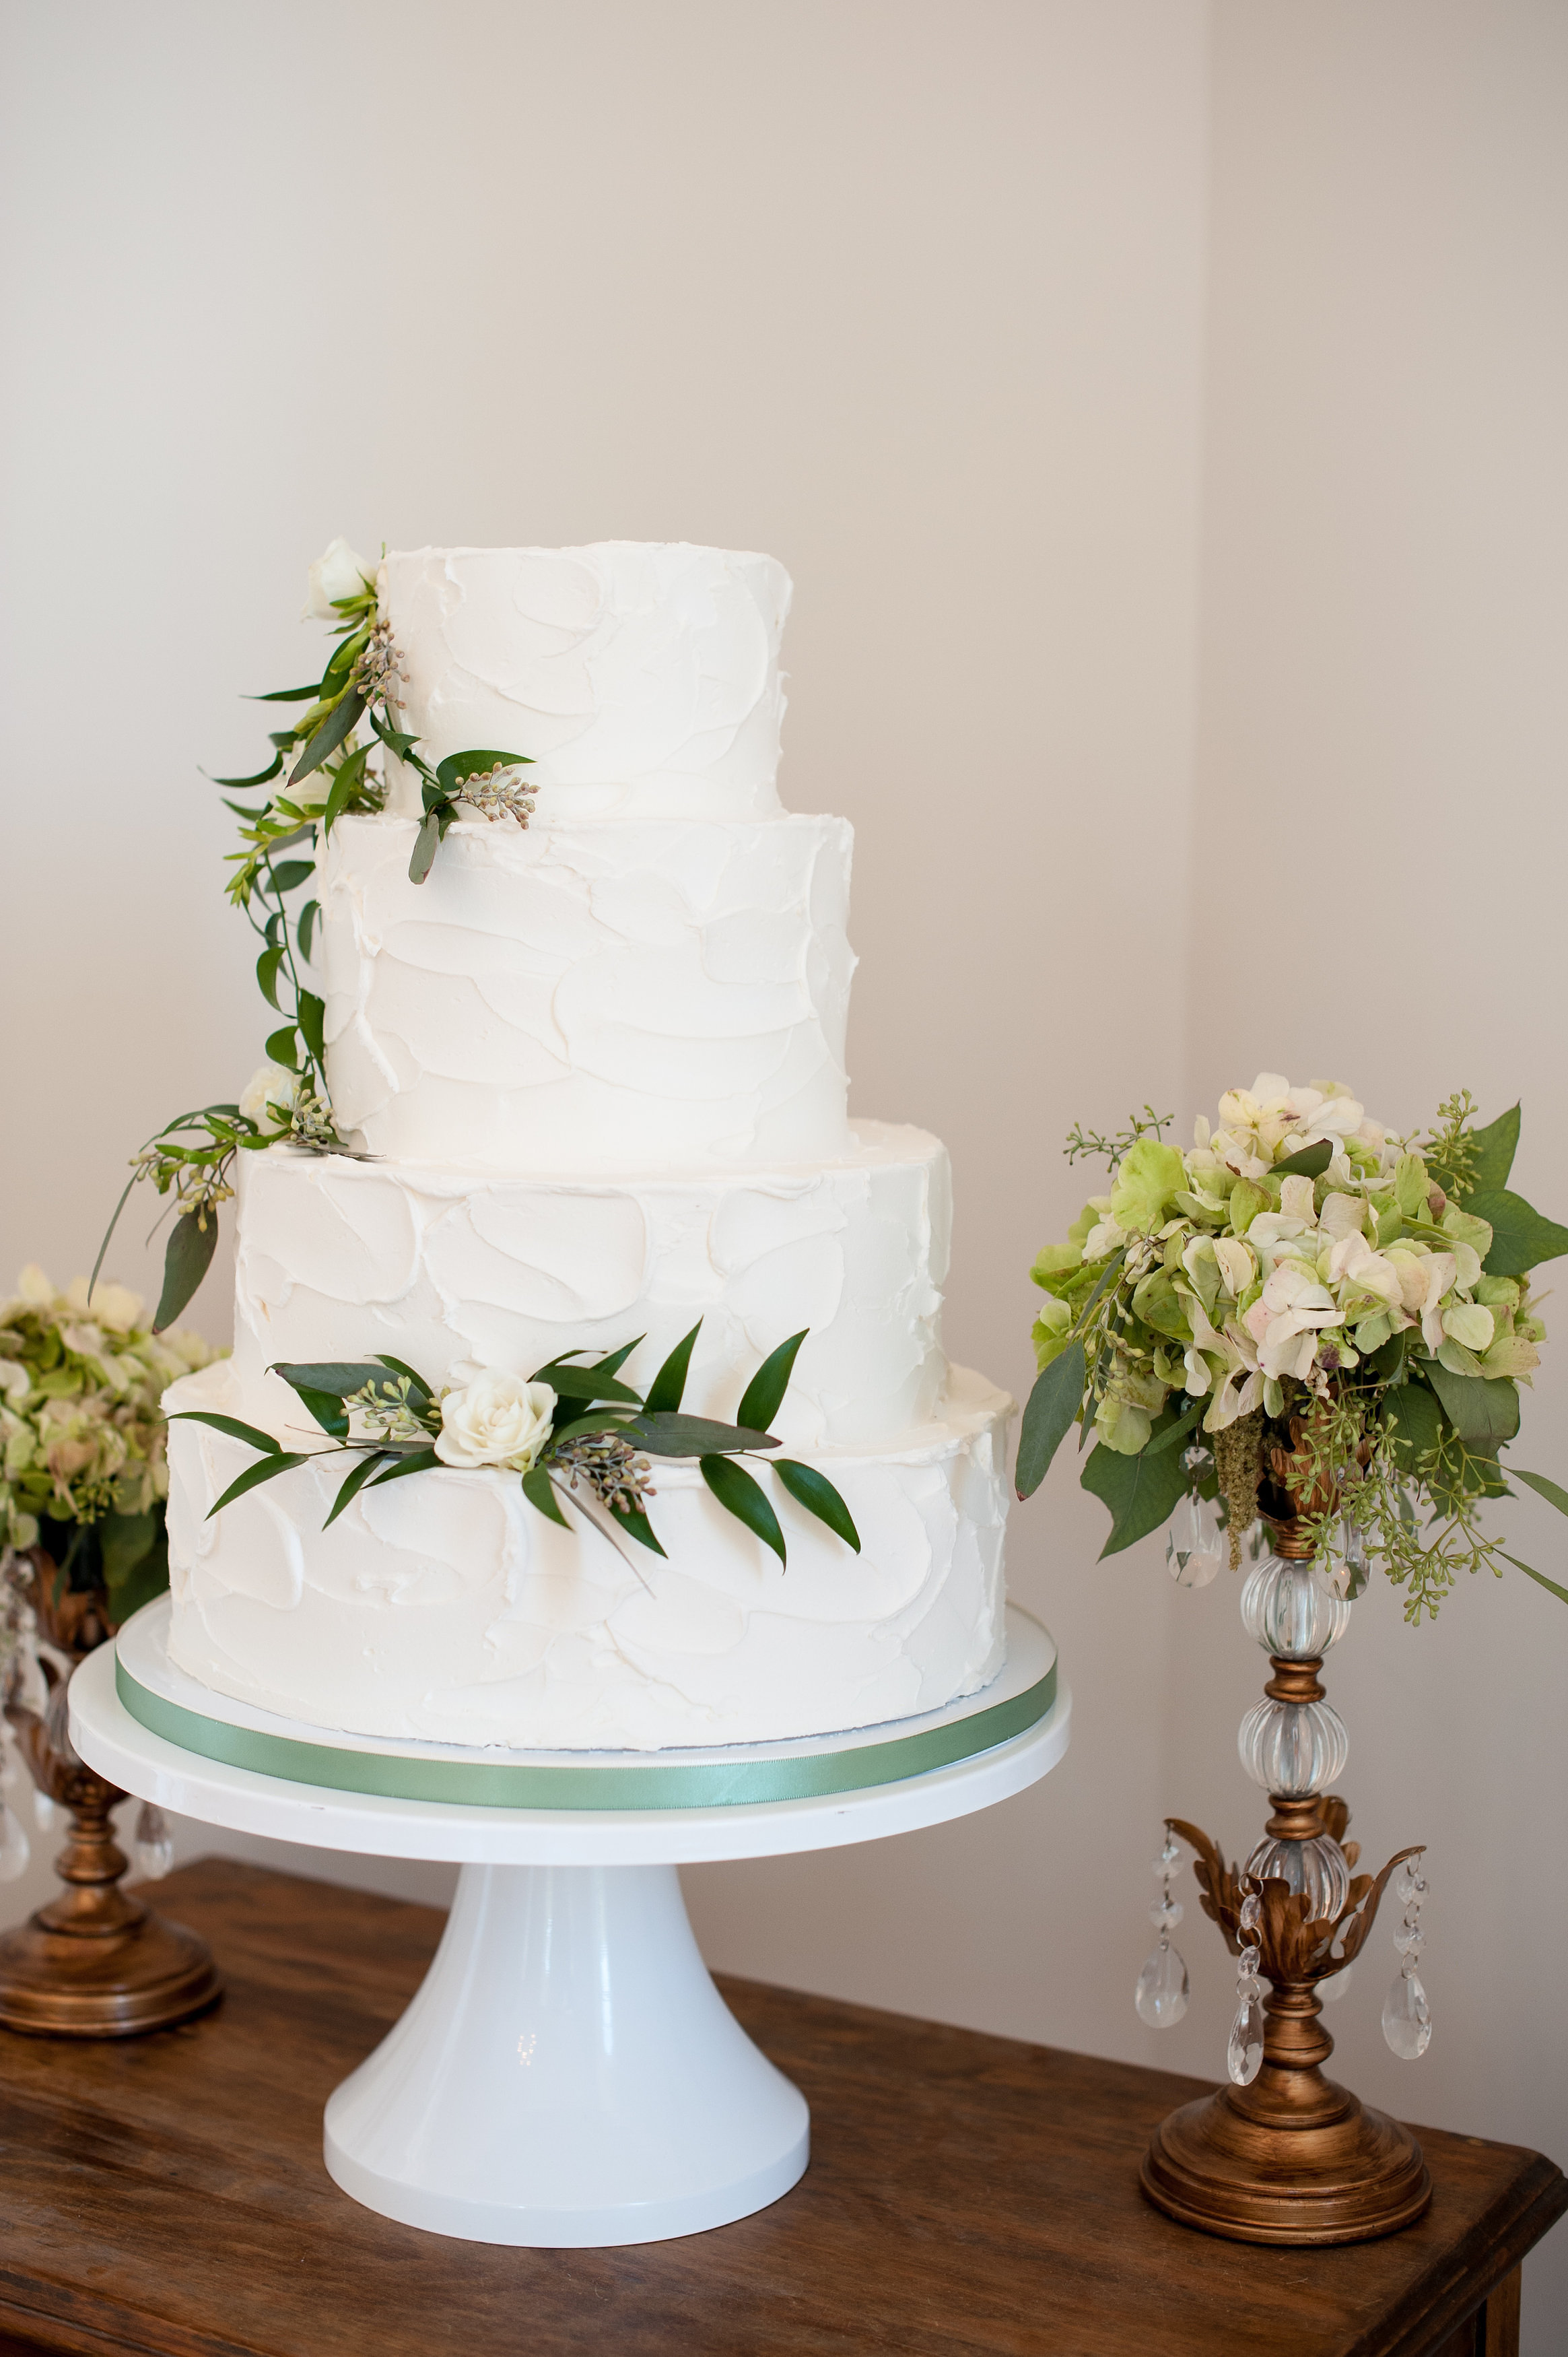 Cake Flowers, Merrimon Wynne Wedding